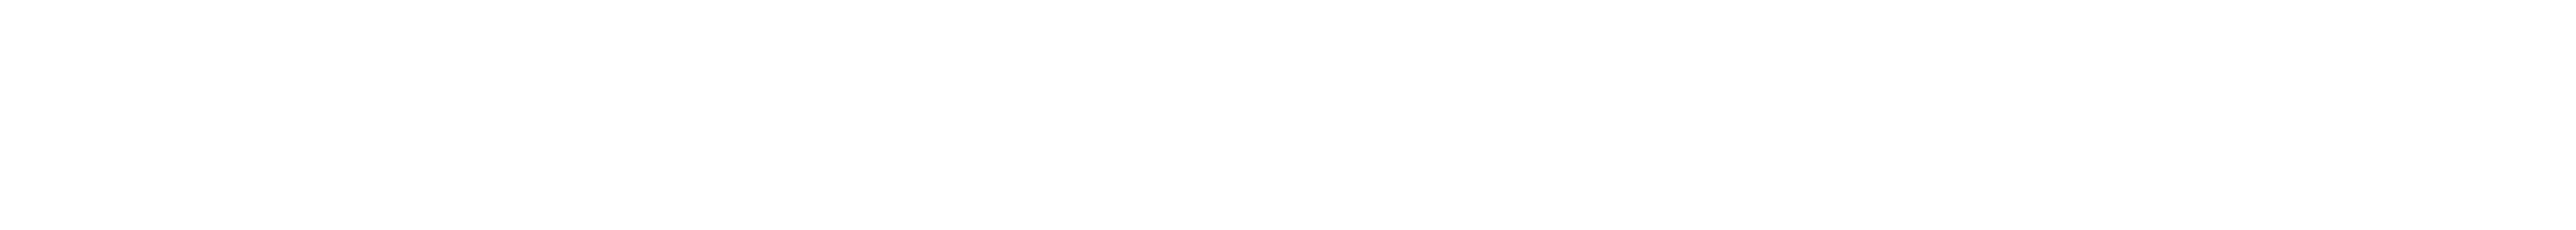 core-bottom-curve